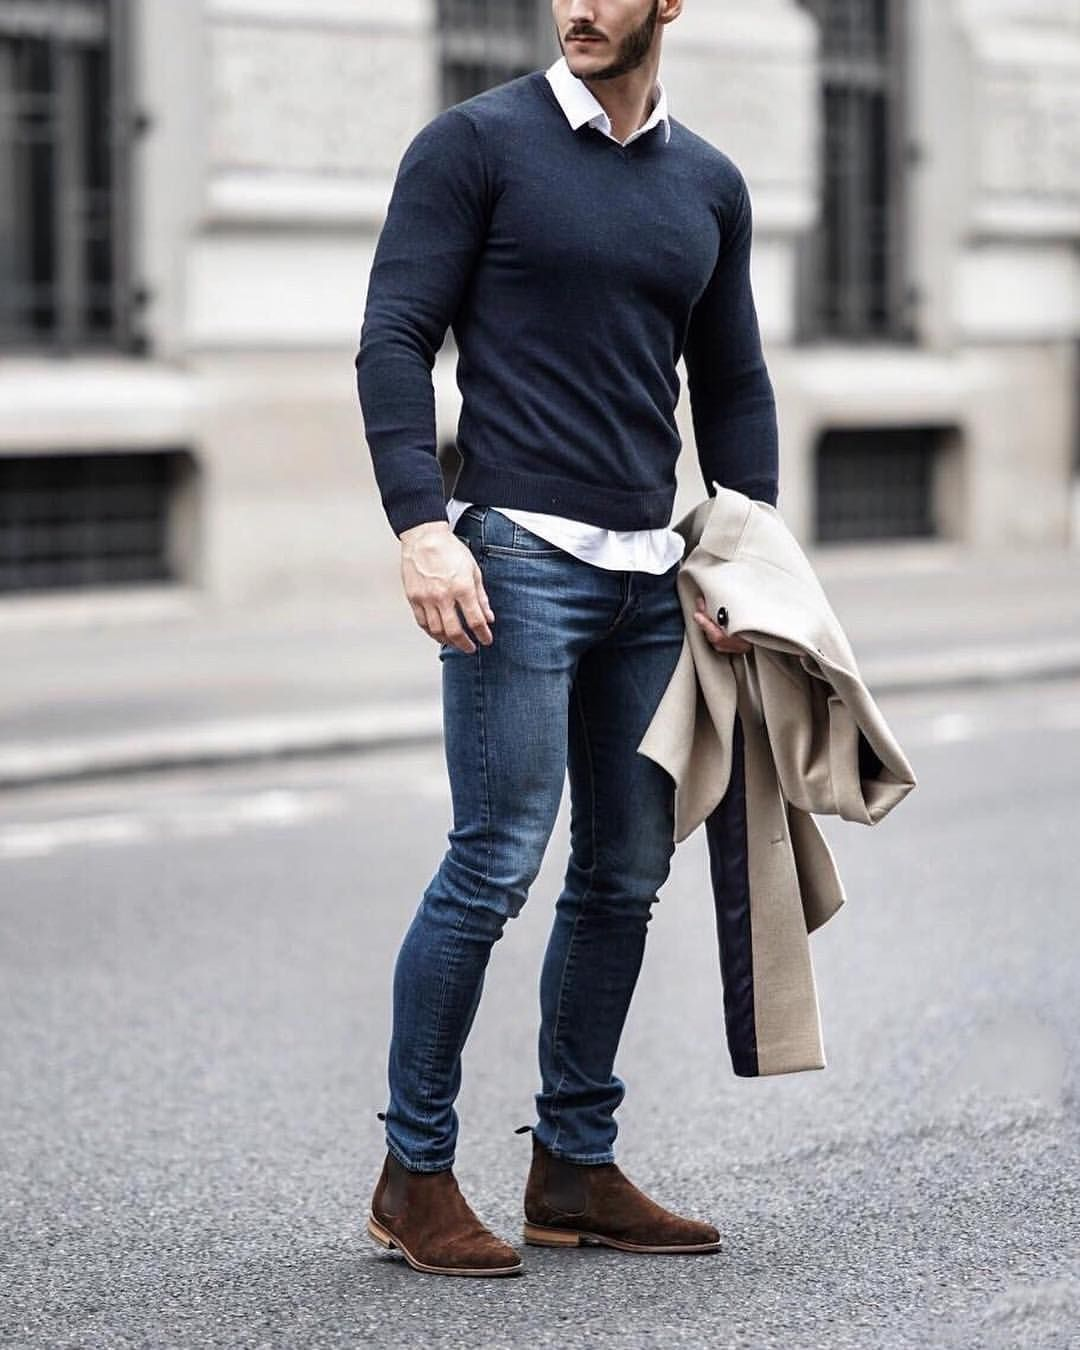 Layered Neutrals #stylishmen